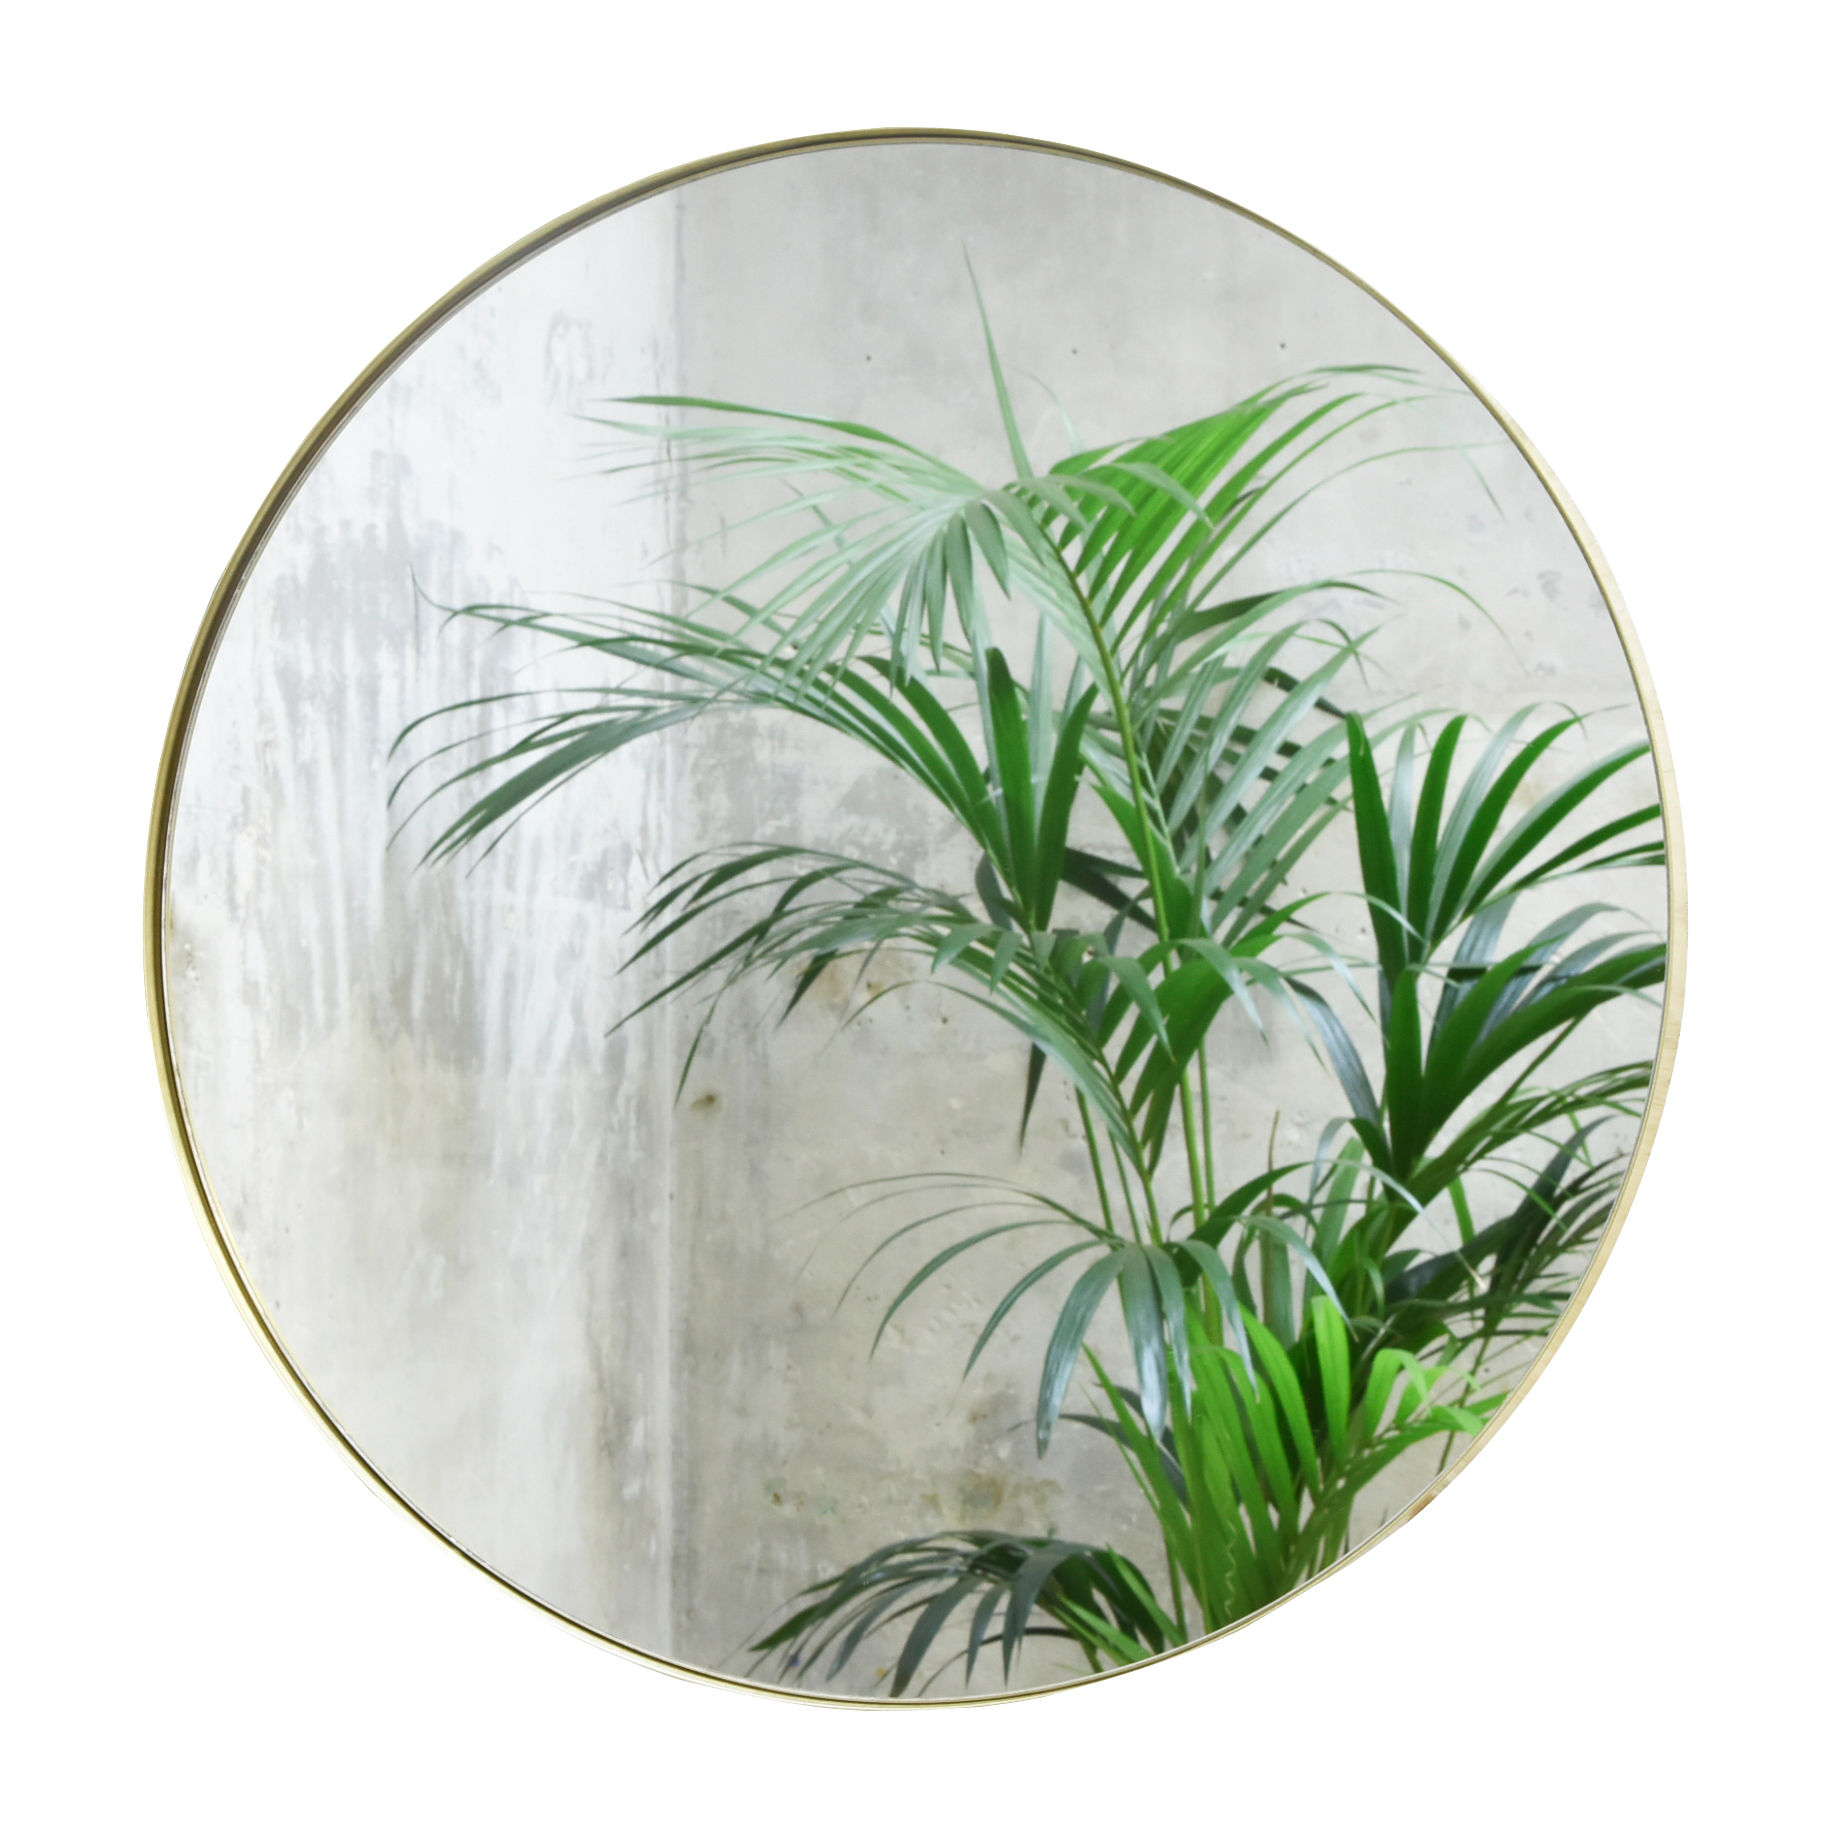 miroir mural cruziana rond 47 cm laiton enostudio made in design. Black Bedroom Furniture Sets. Home Design Ideas